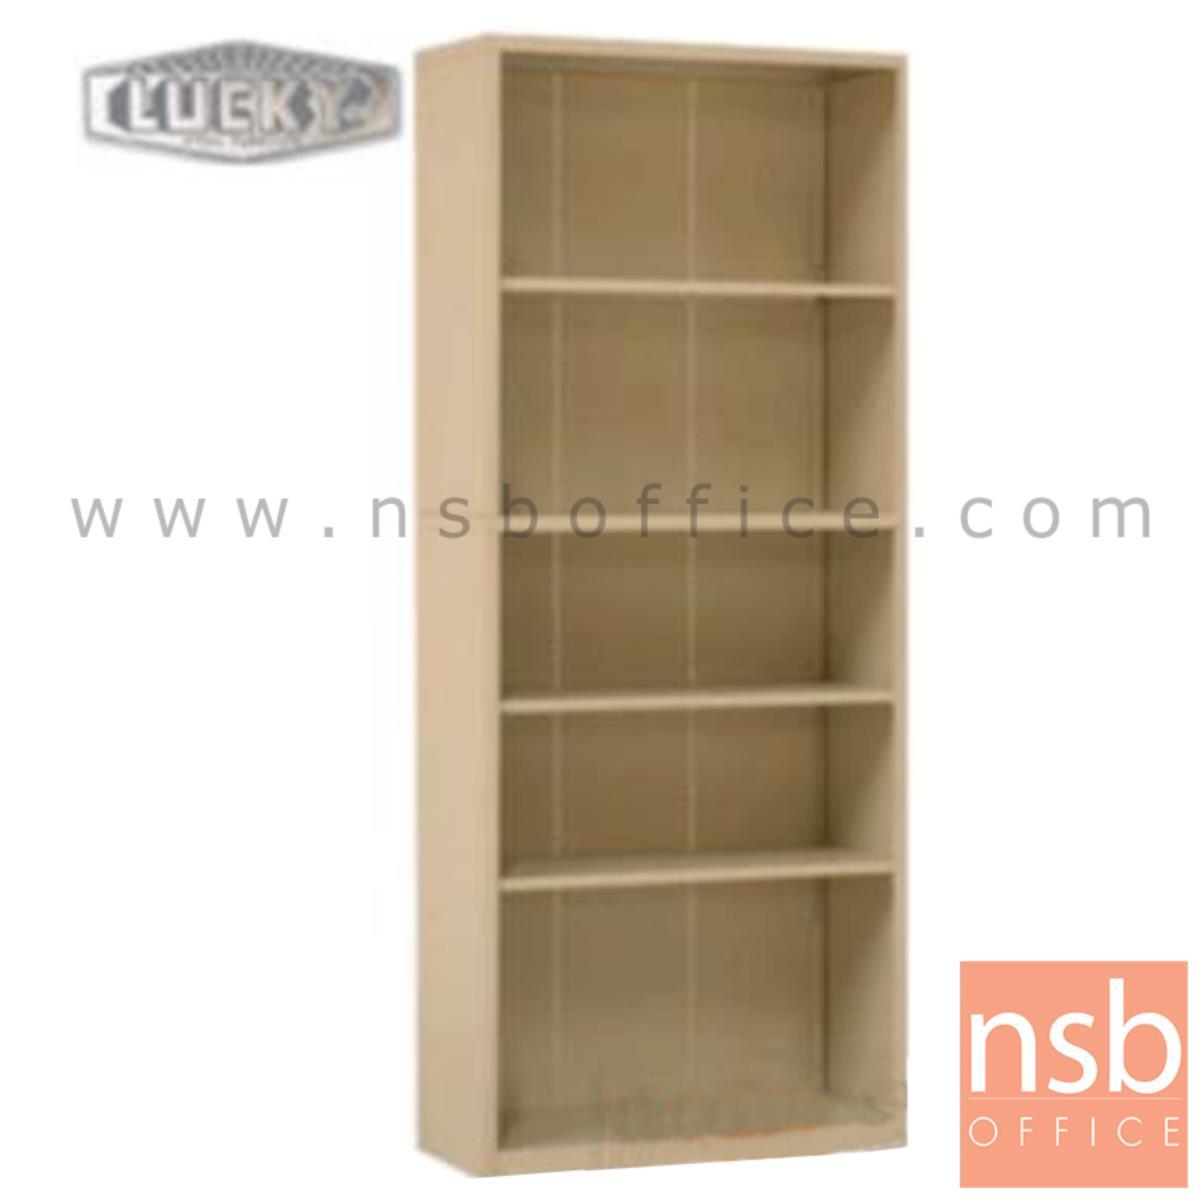 E28A034:ตู้วางหนังสือ 5 ช่องโล่ง 76.2W*32D*182.9H cm. รุ่น LUCKY-SB-3072